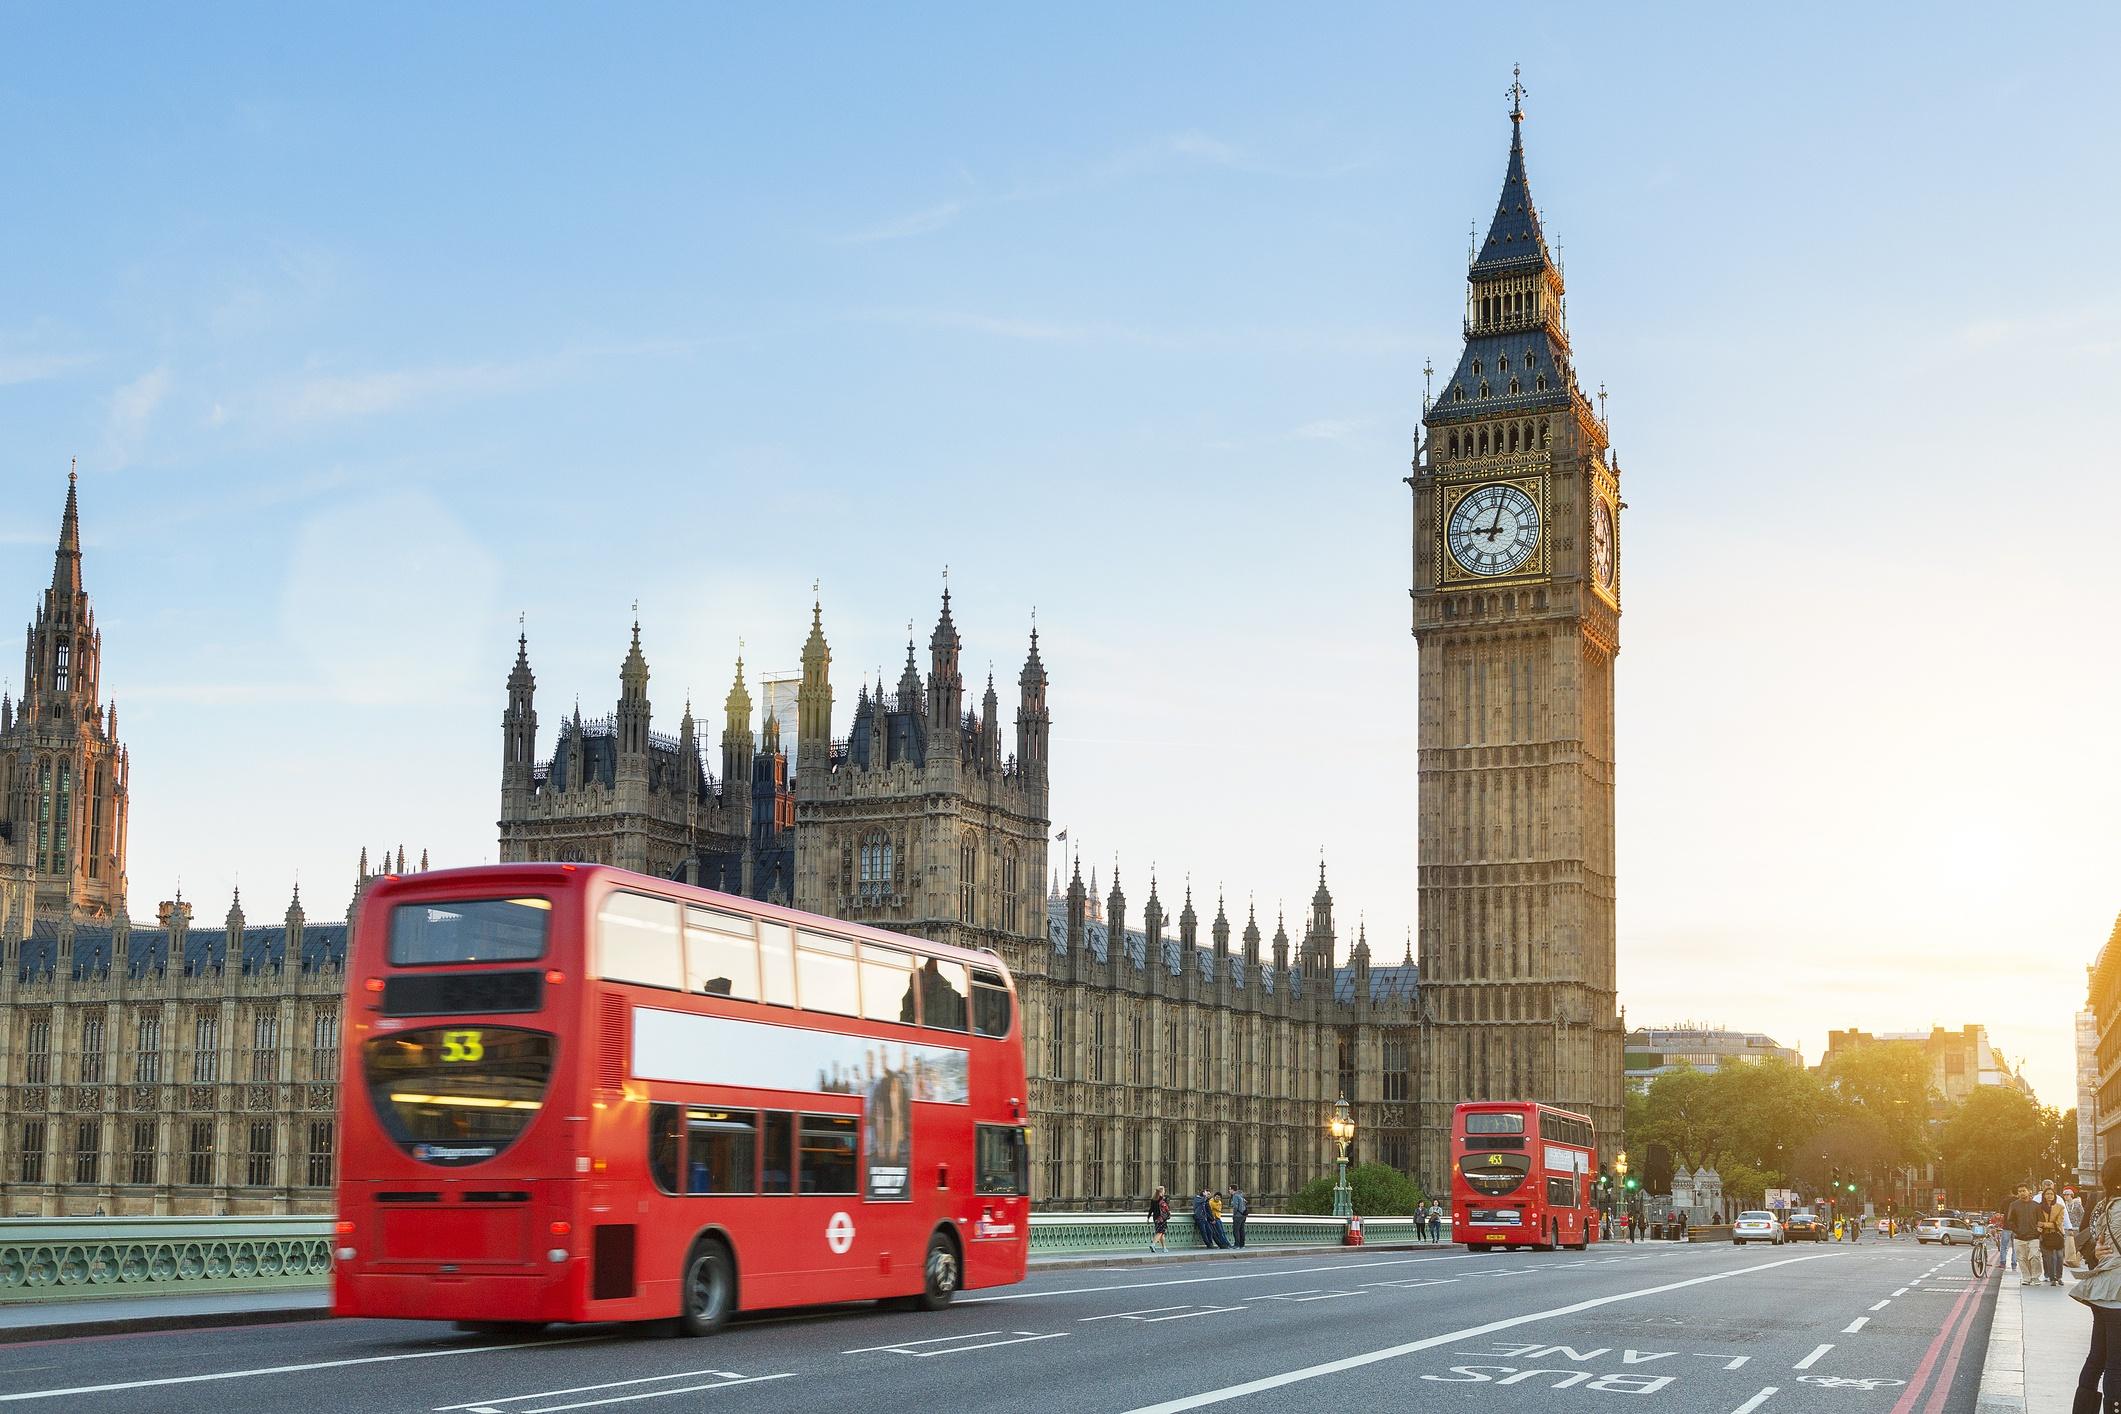 London, Traffic on the Westminster bridge